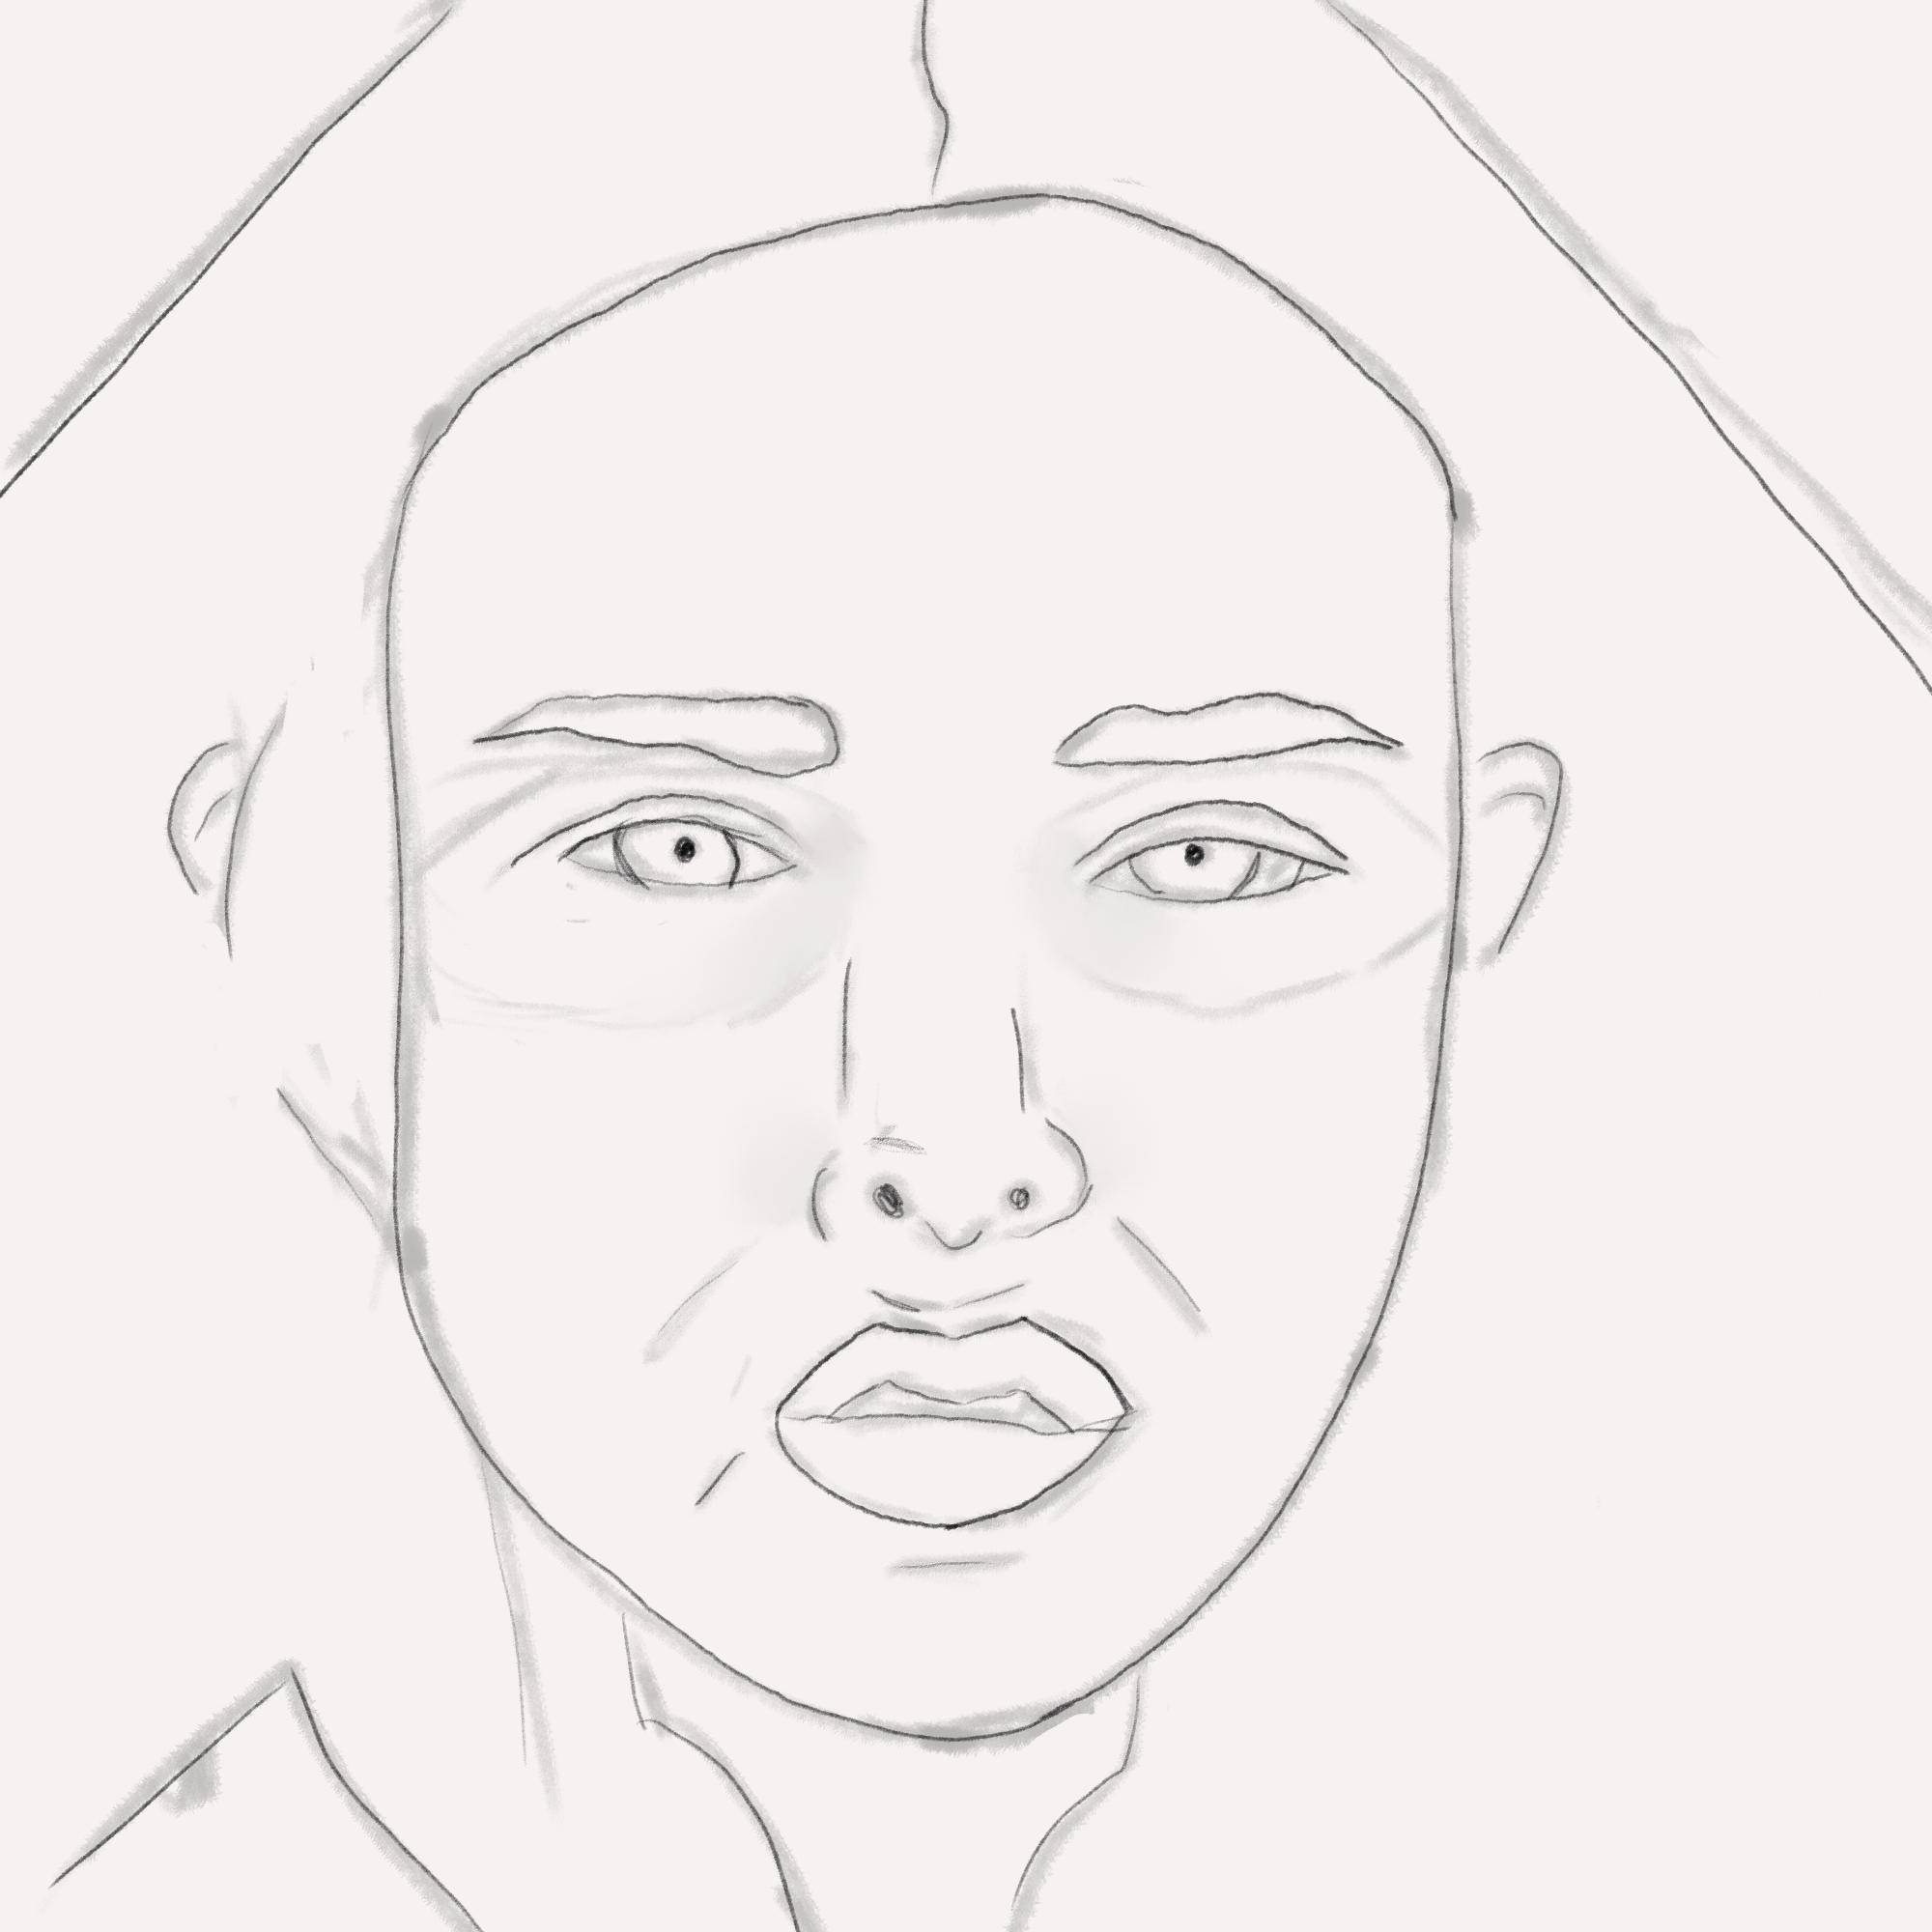 Day 1 - Base Sketch